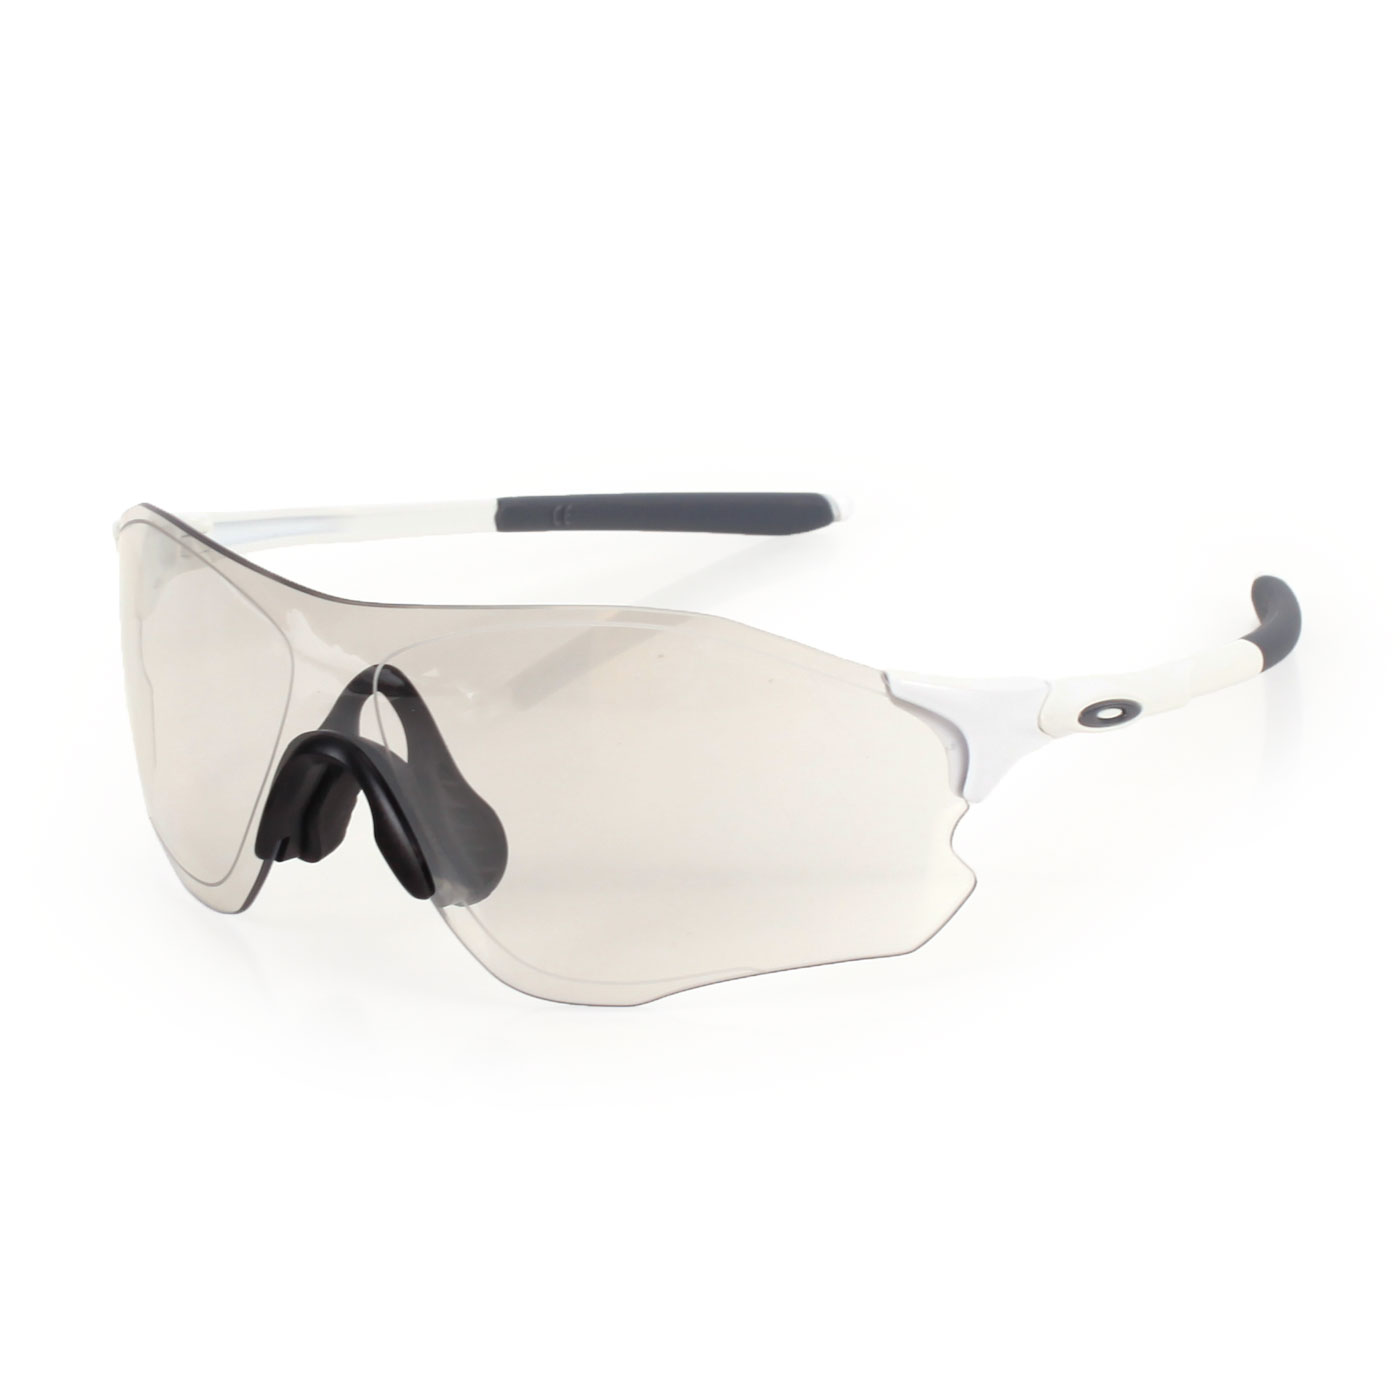 OAKLEY (A) EVZERO PATH CLR BLK PHT 太陽眼鏡(附硬盒鼻墊) OAK-OO9313-06